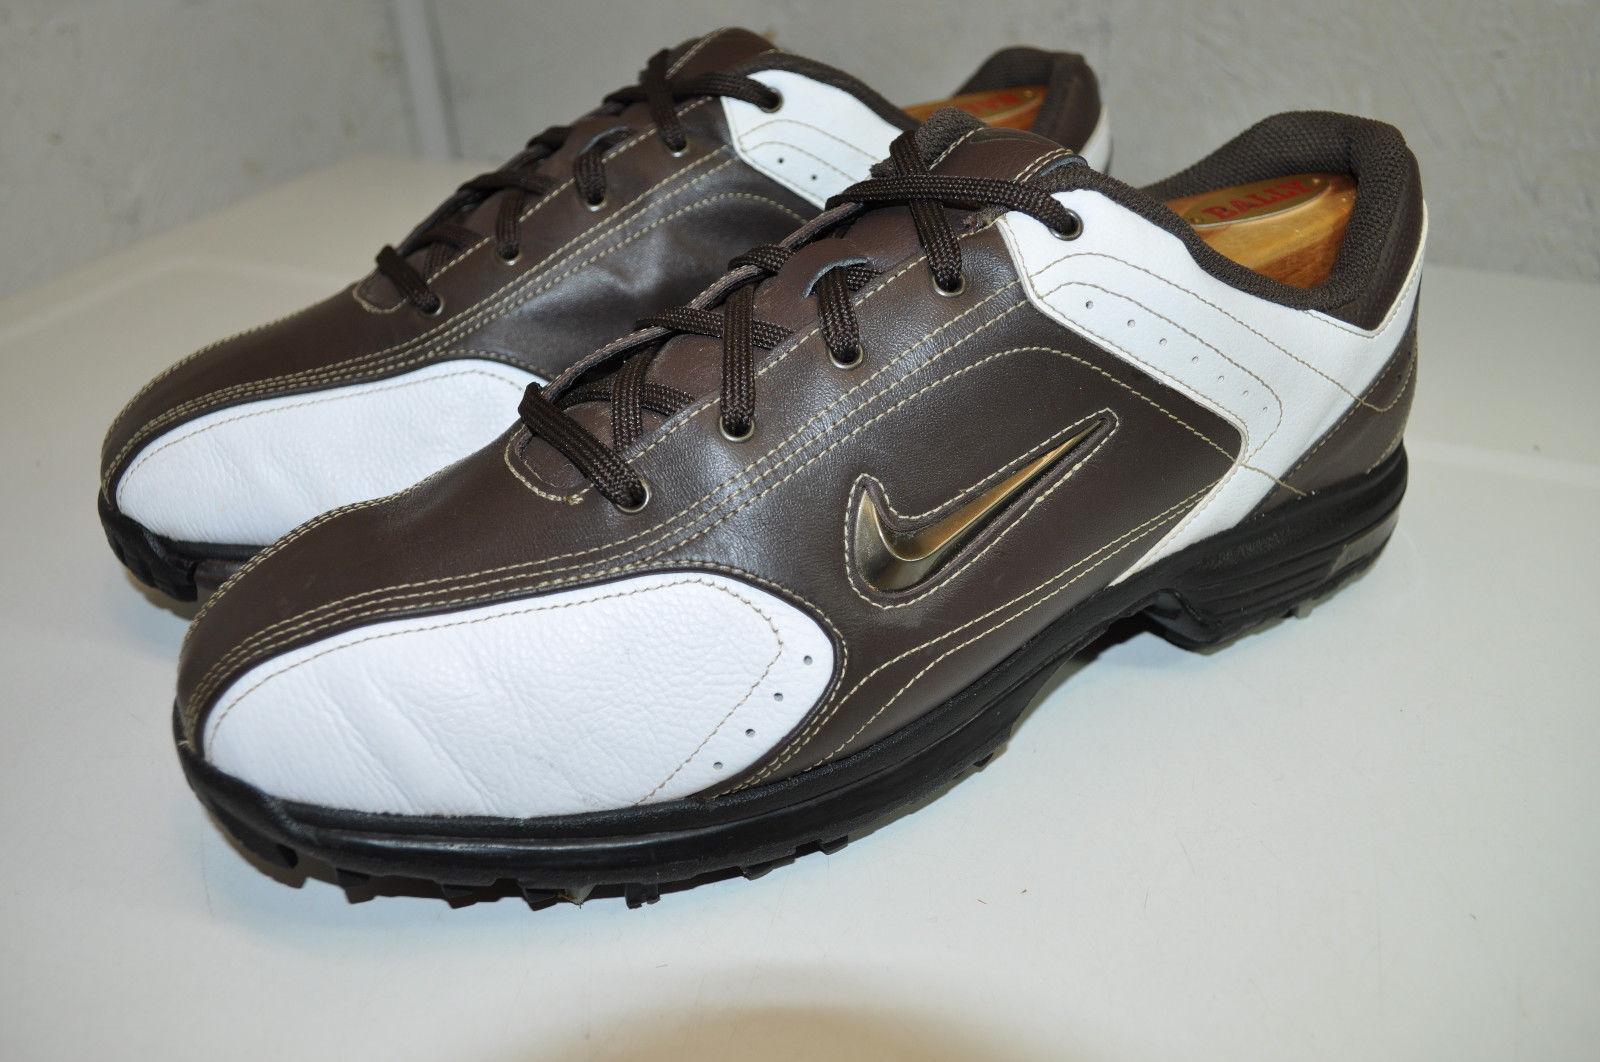 NIKE Golf Schuhe Neu Braun Sneaker Tour Classic Gr:40 US:7 Outsole 336038-101